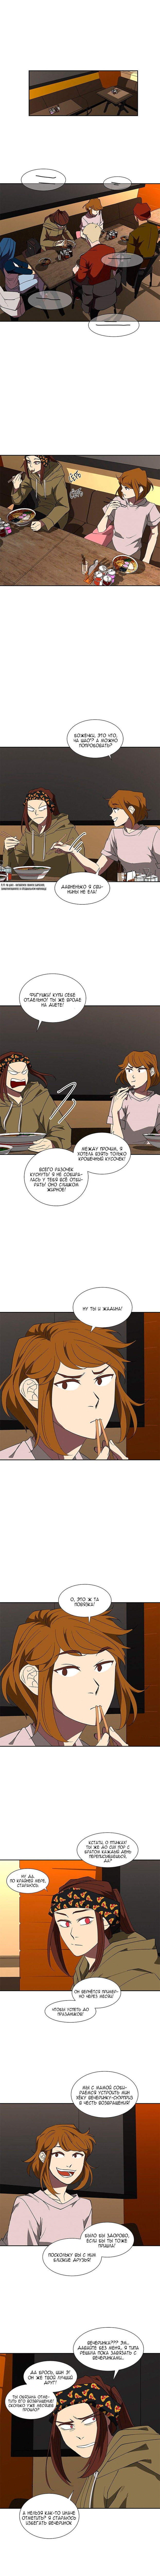 Манга Я люблю Ю / I love Yoo  - Том 1 Глава 70 Страница 8